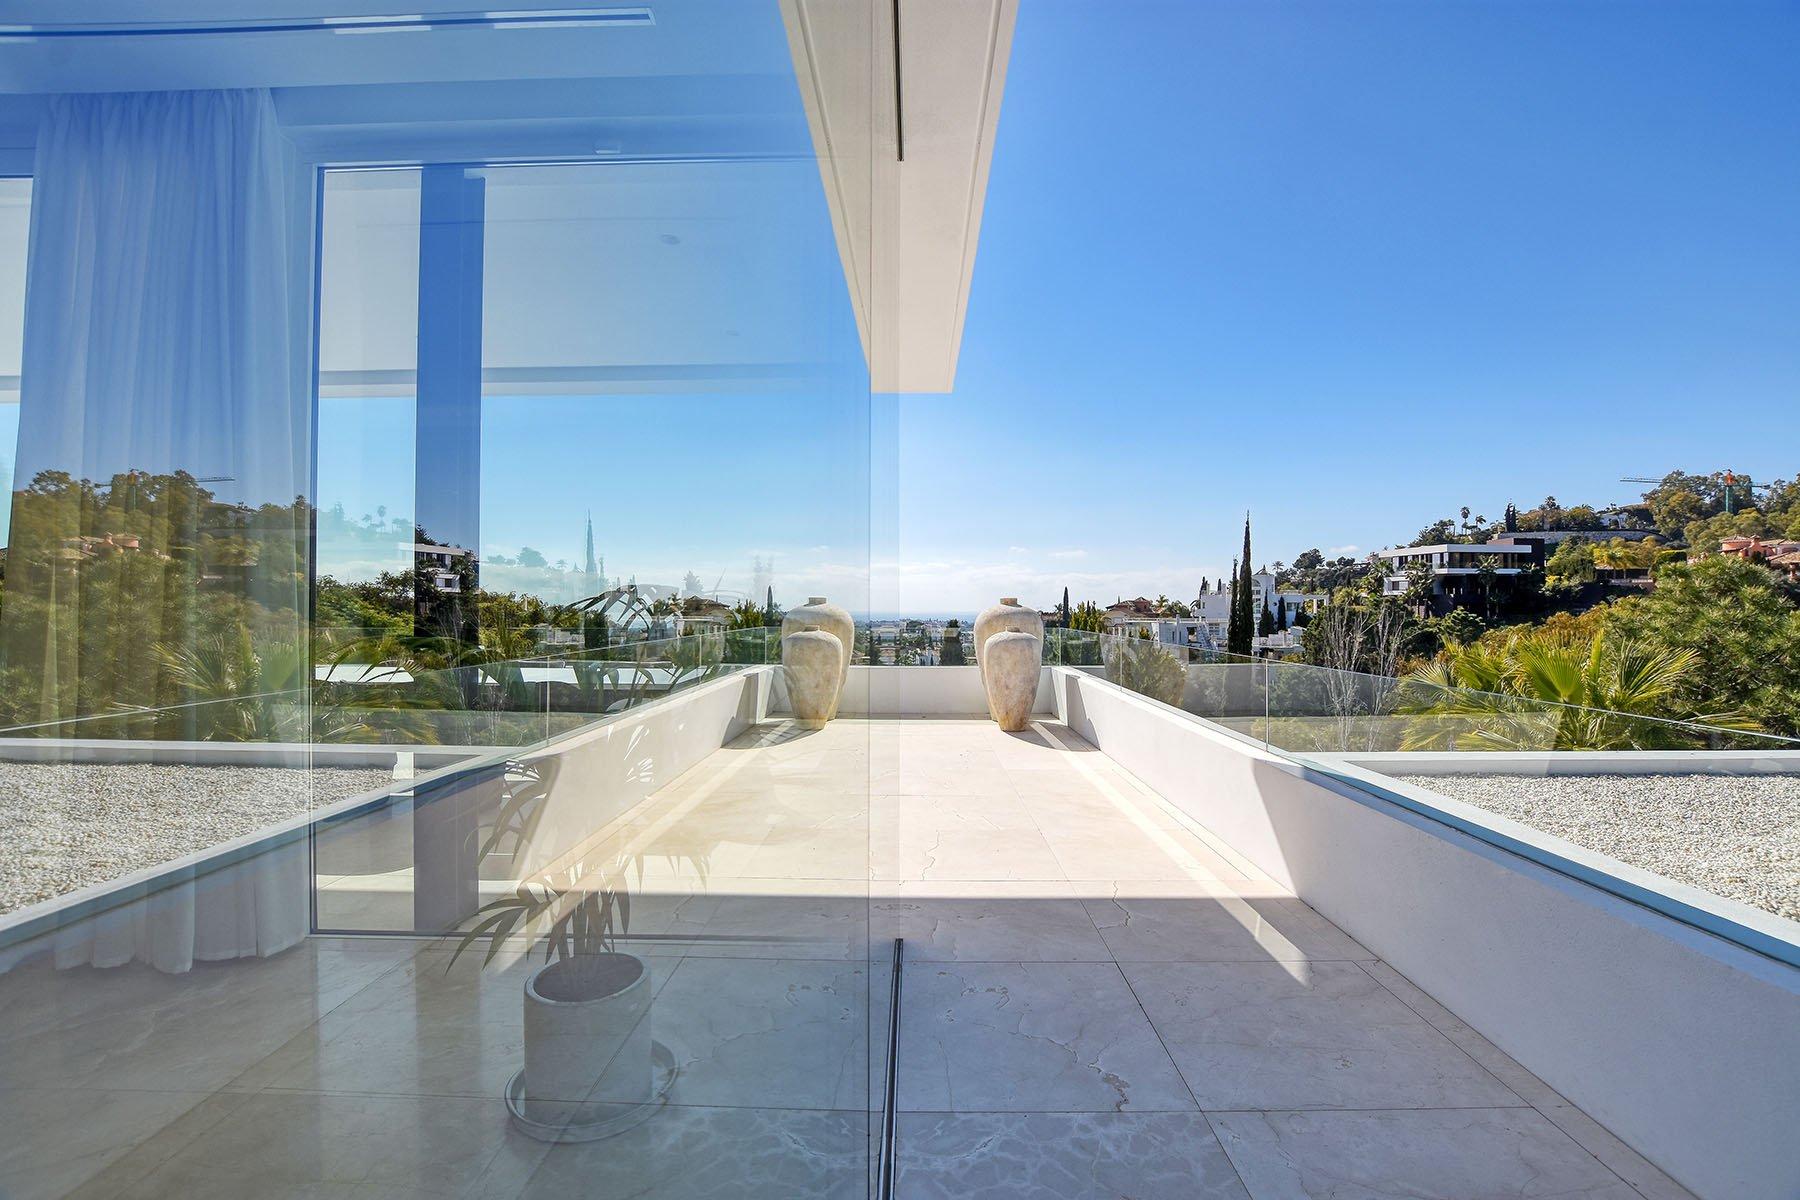 Property Photographer, Floor Planner & 360° Virtual Tour Creator